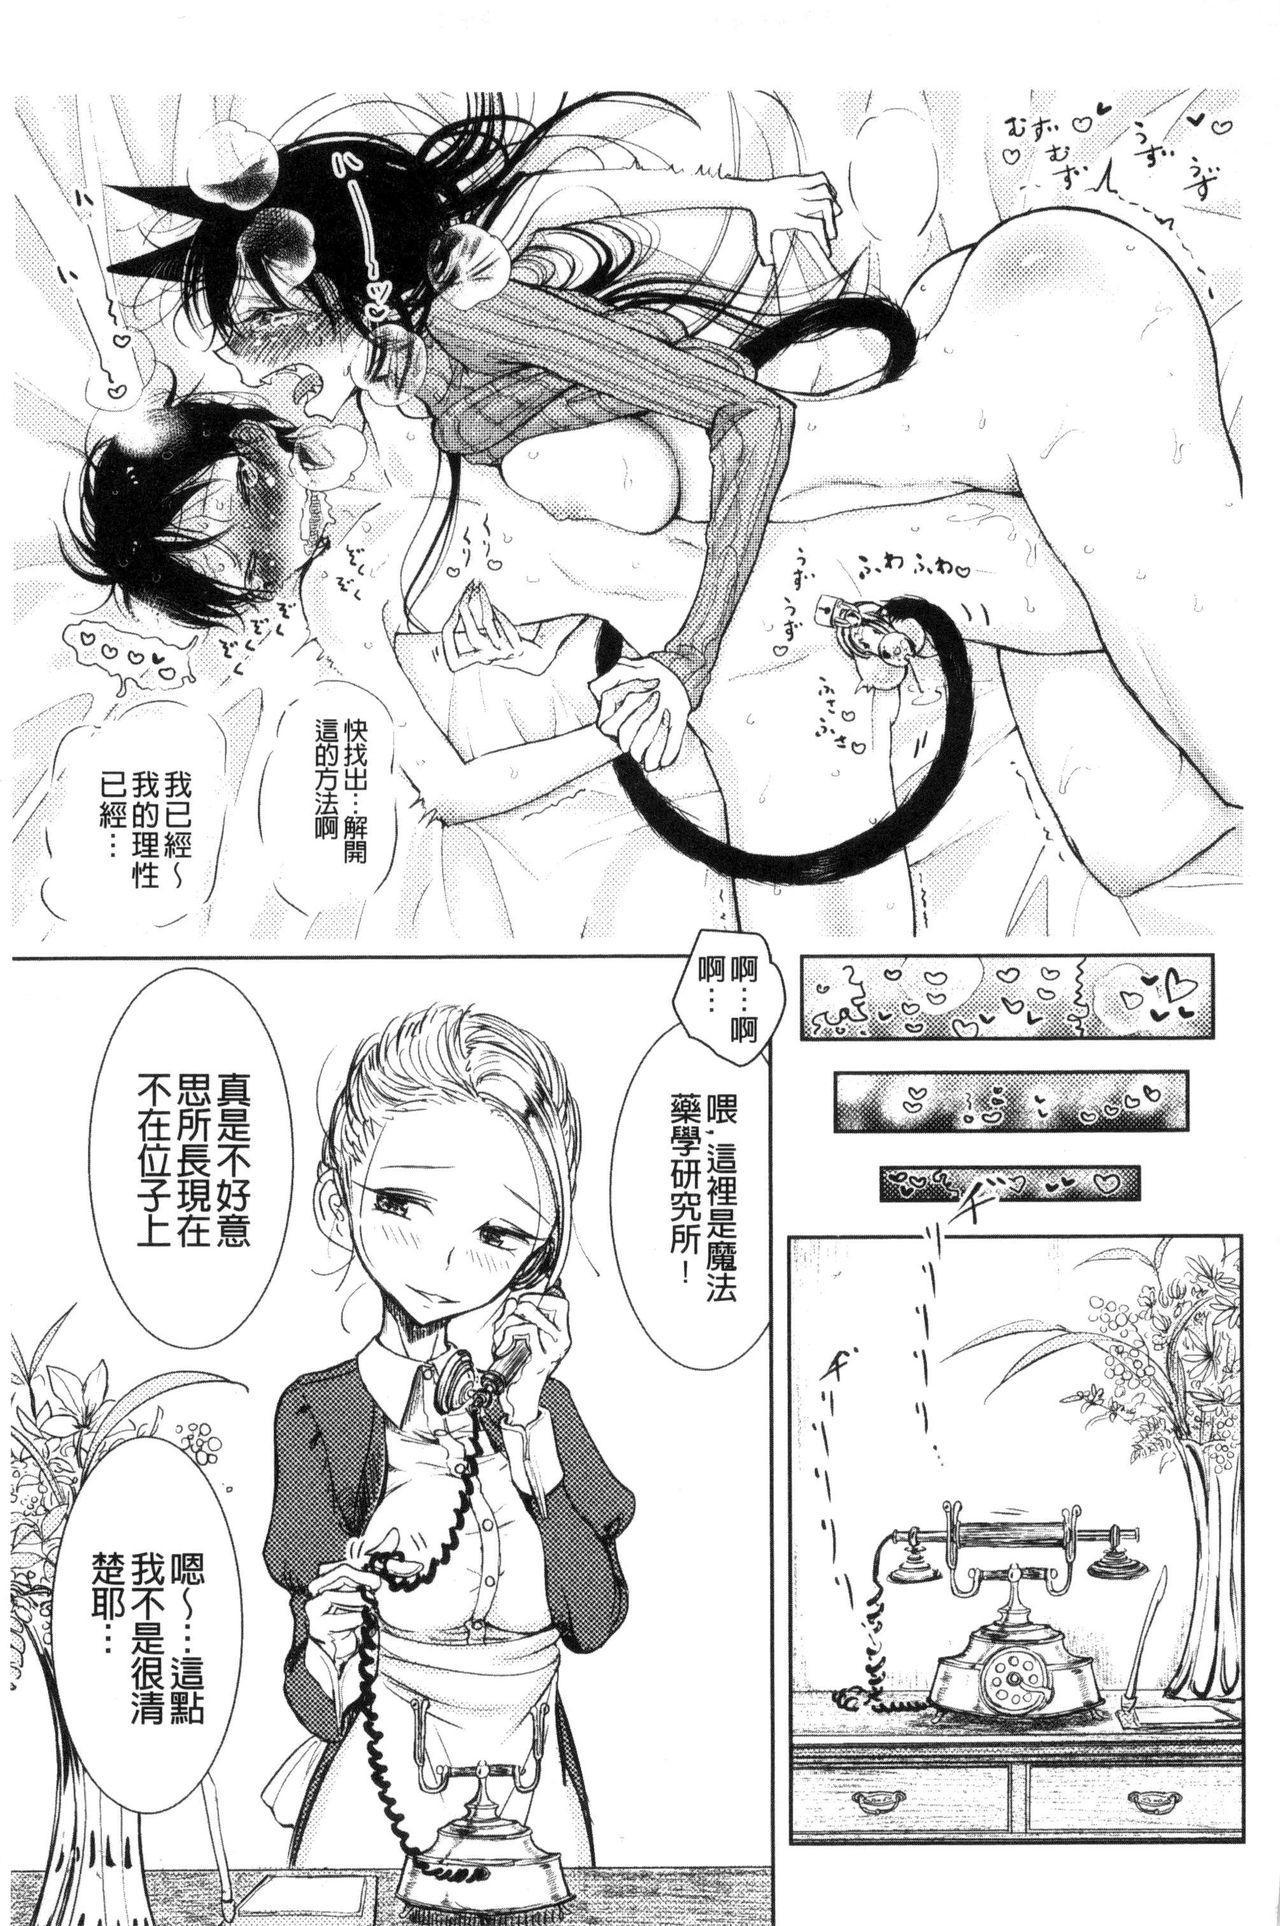 [Dhibi] Sono Yubisaki de Korogashite - Please Caress it at the Finger-tip. [Chinese] 42